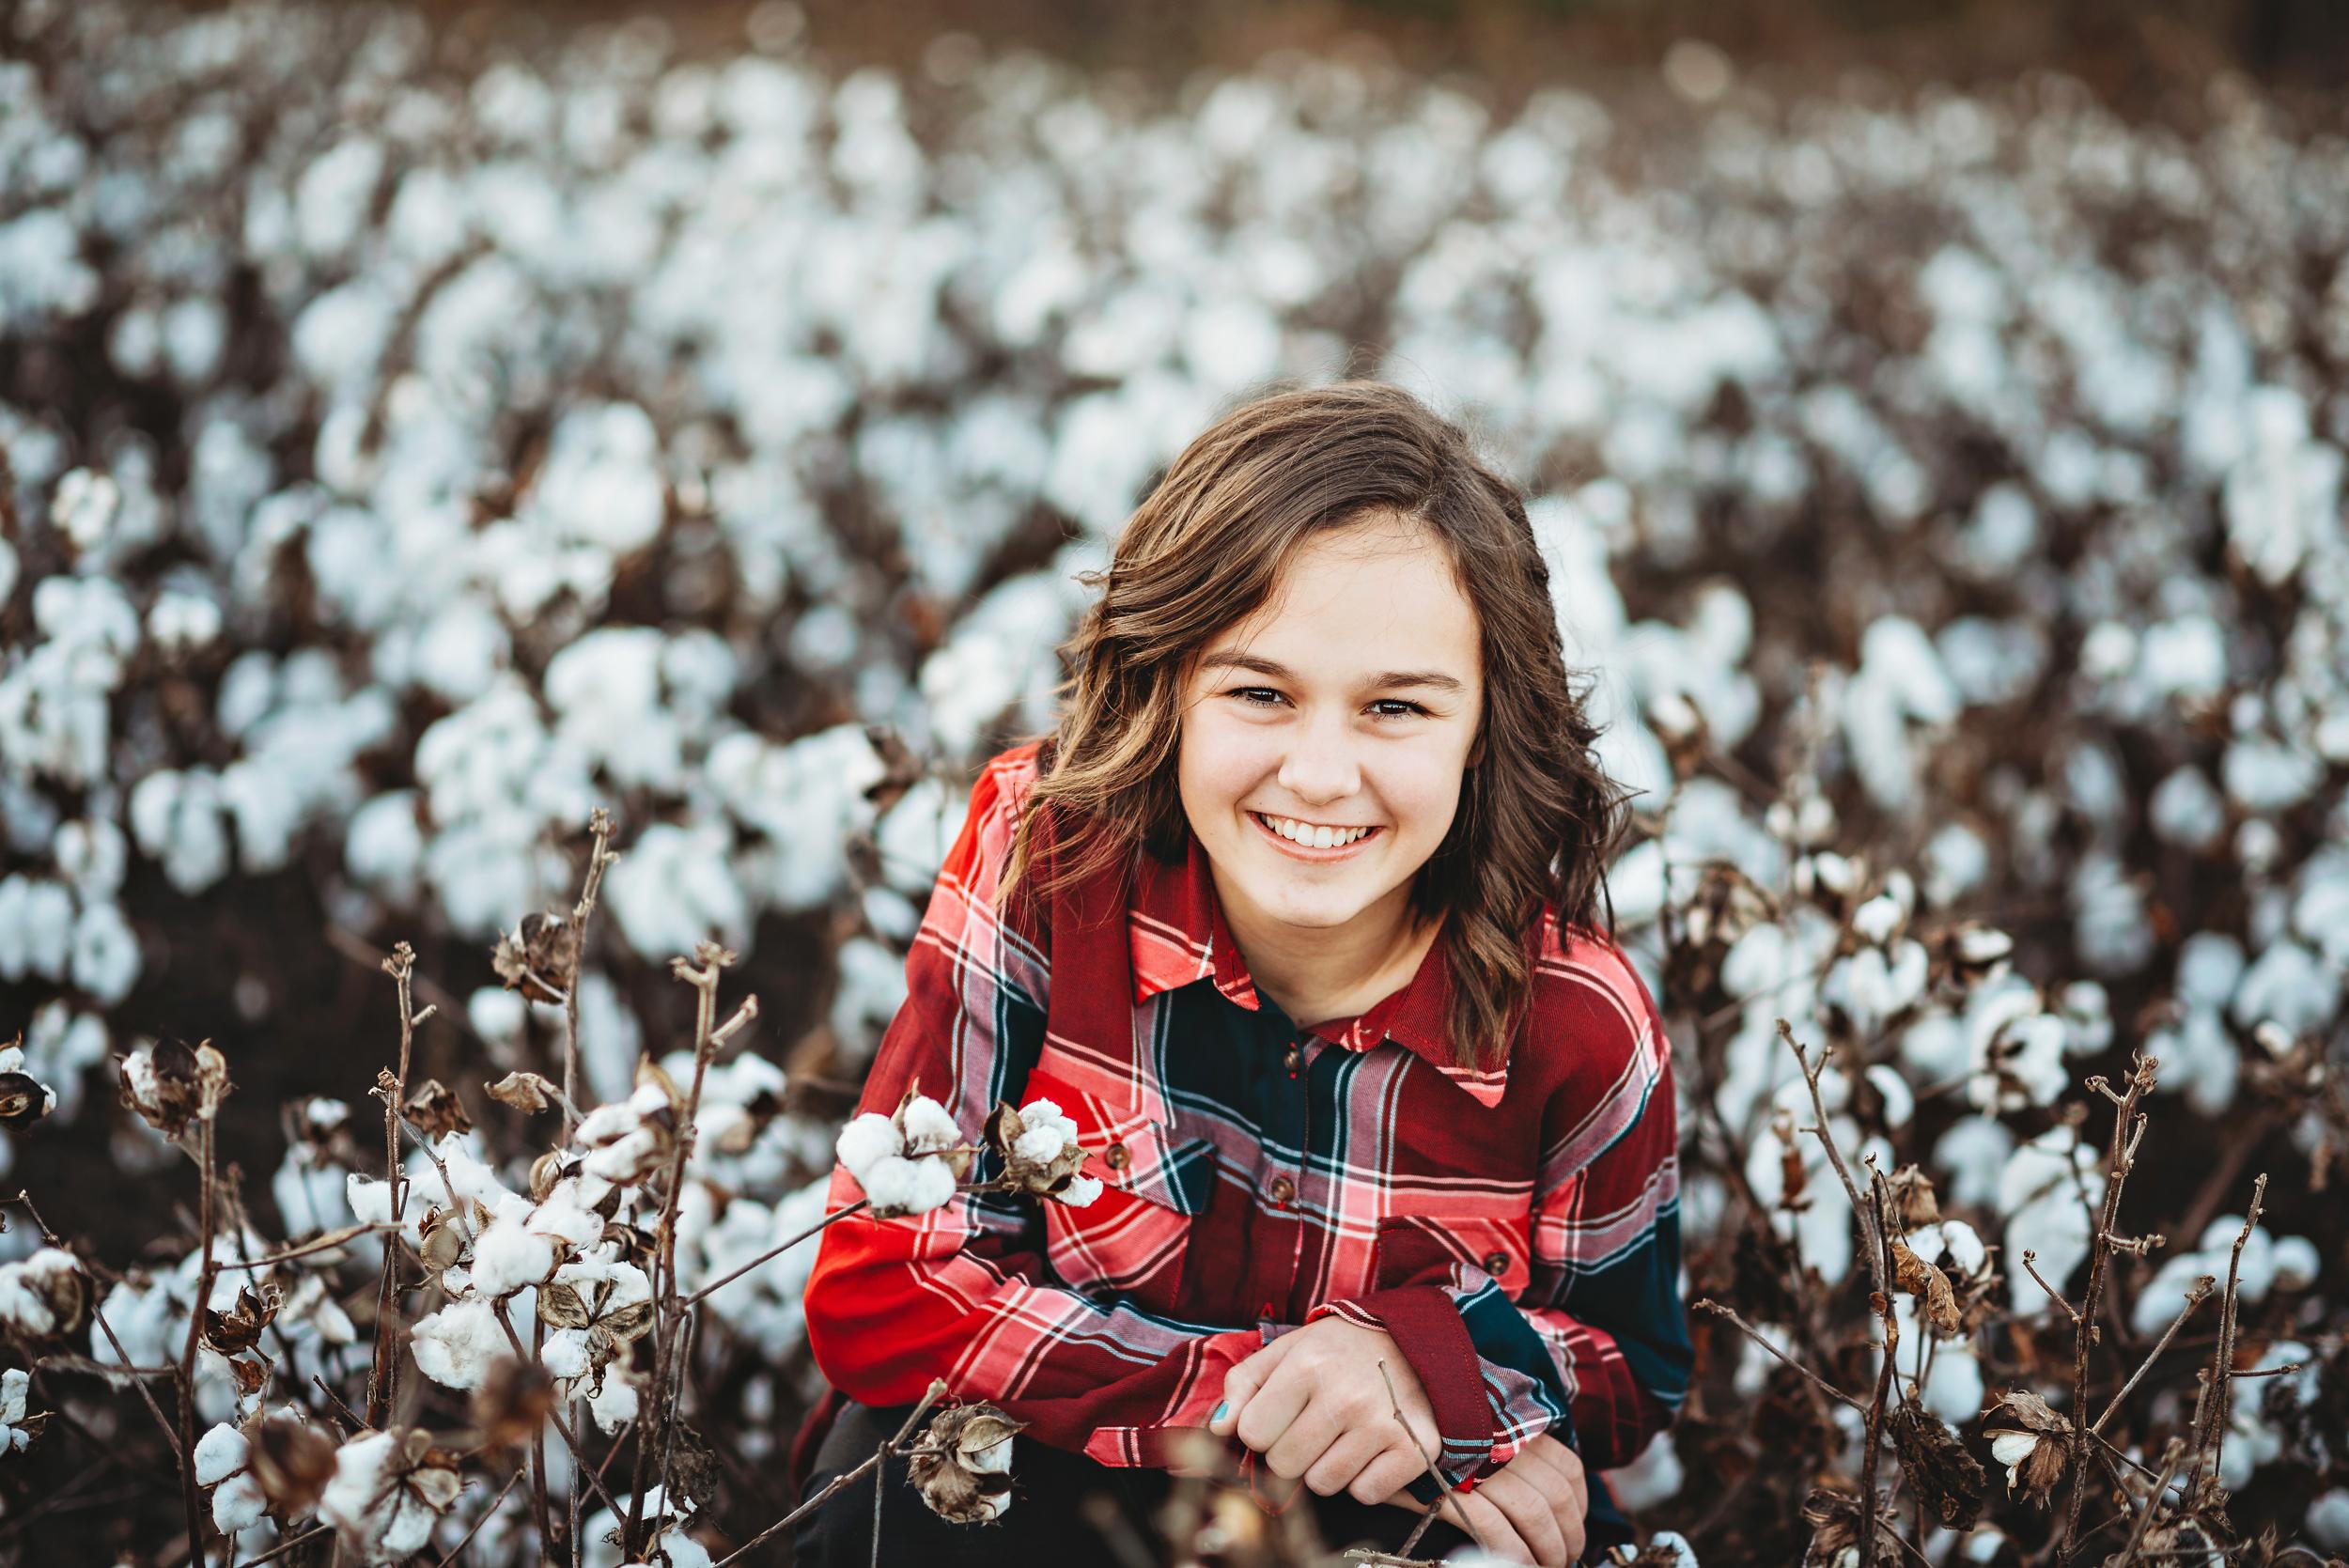 buhler kansas, child photography, family photographer, shannon schneider photography